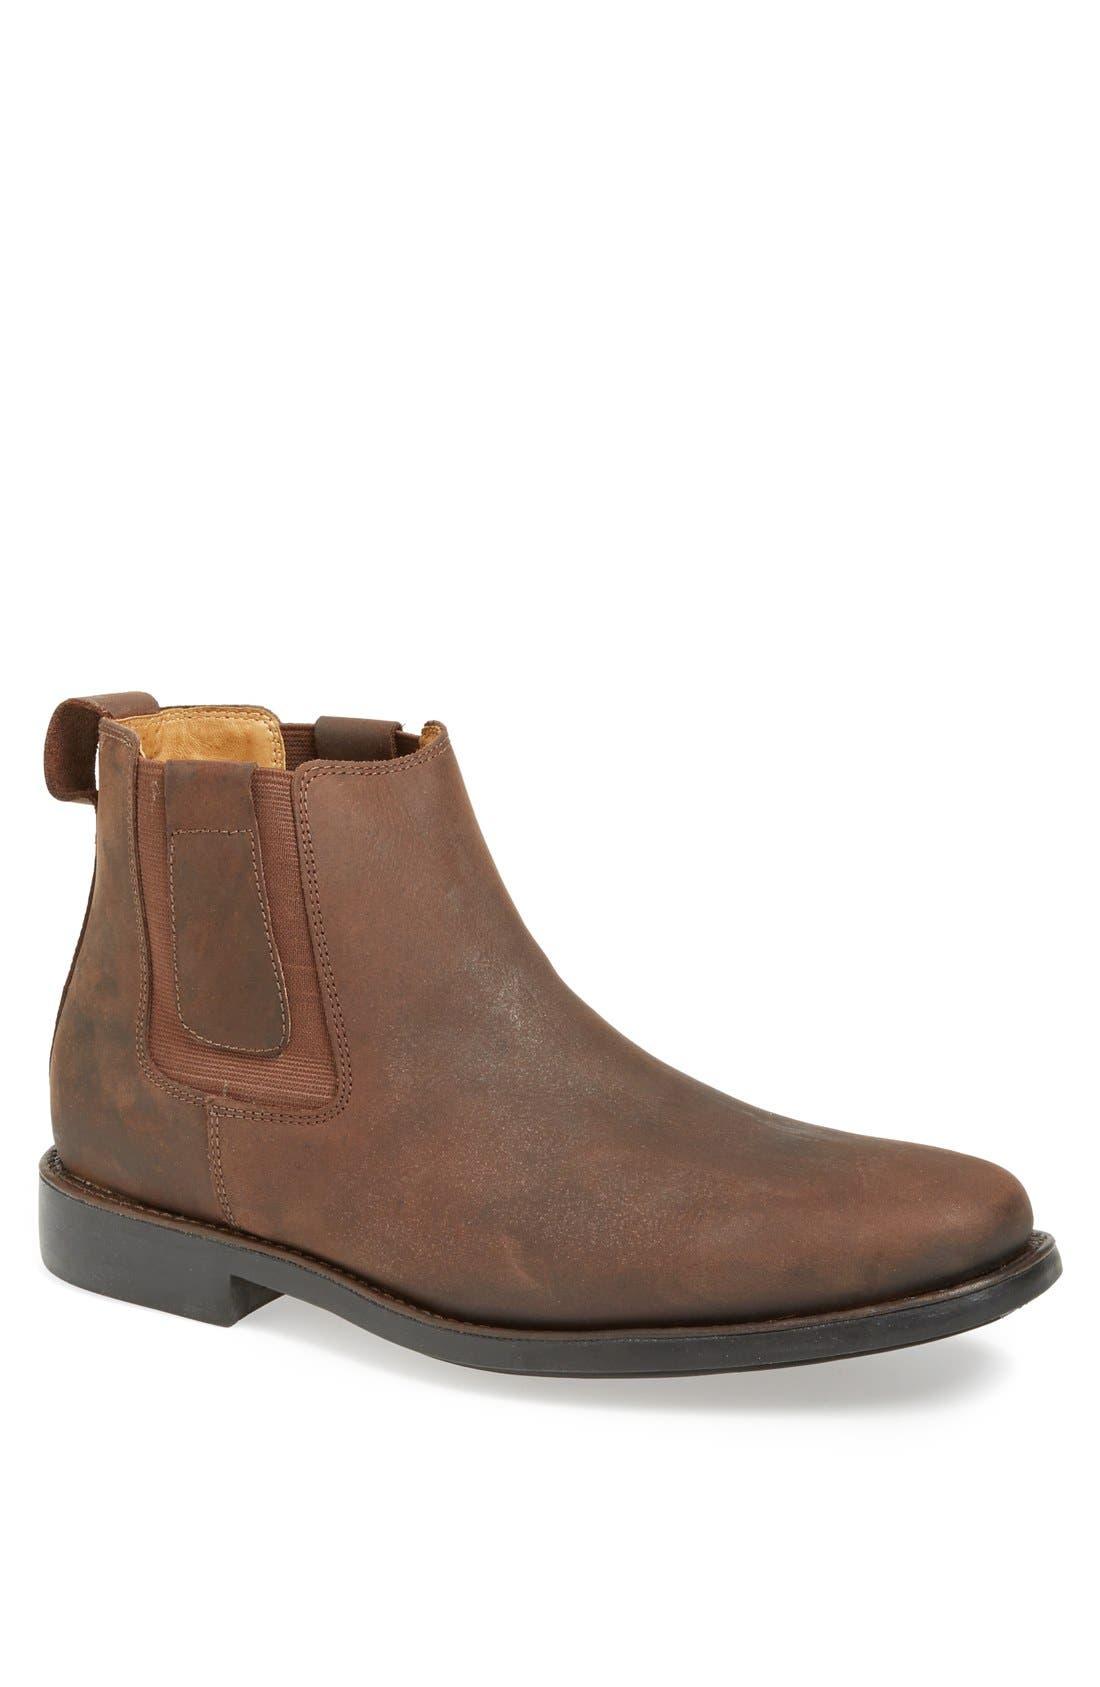 Natal Chelsea Boot,                         Main,                         color, Brown